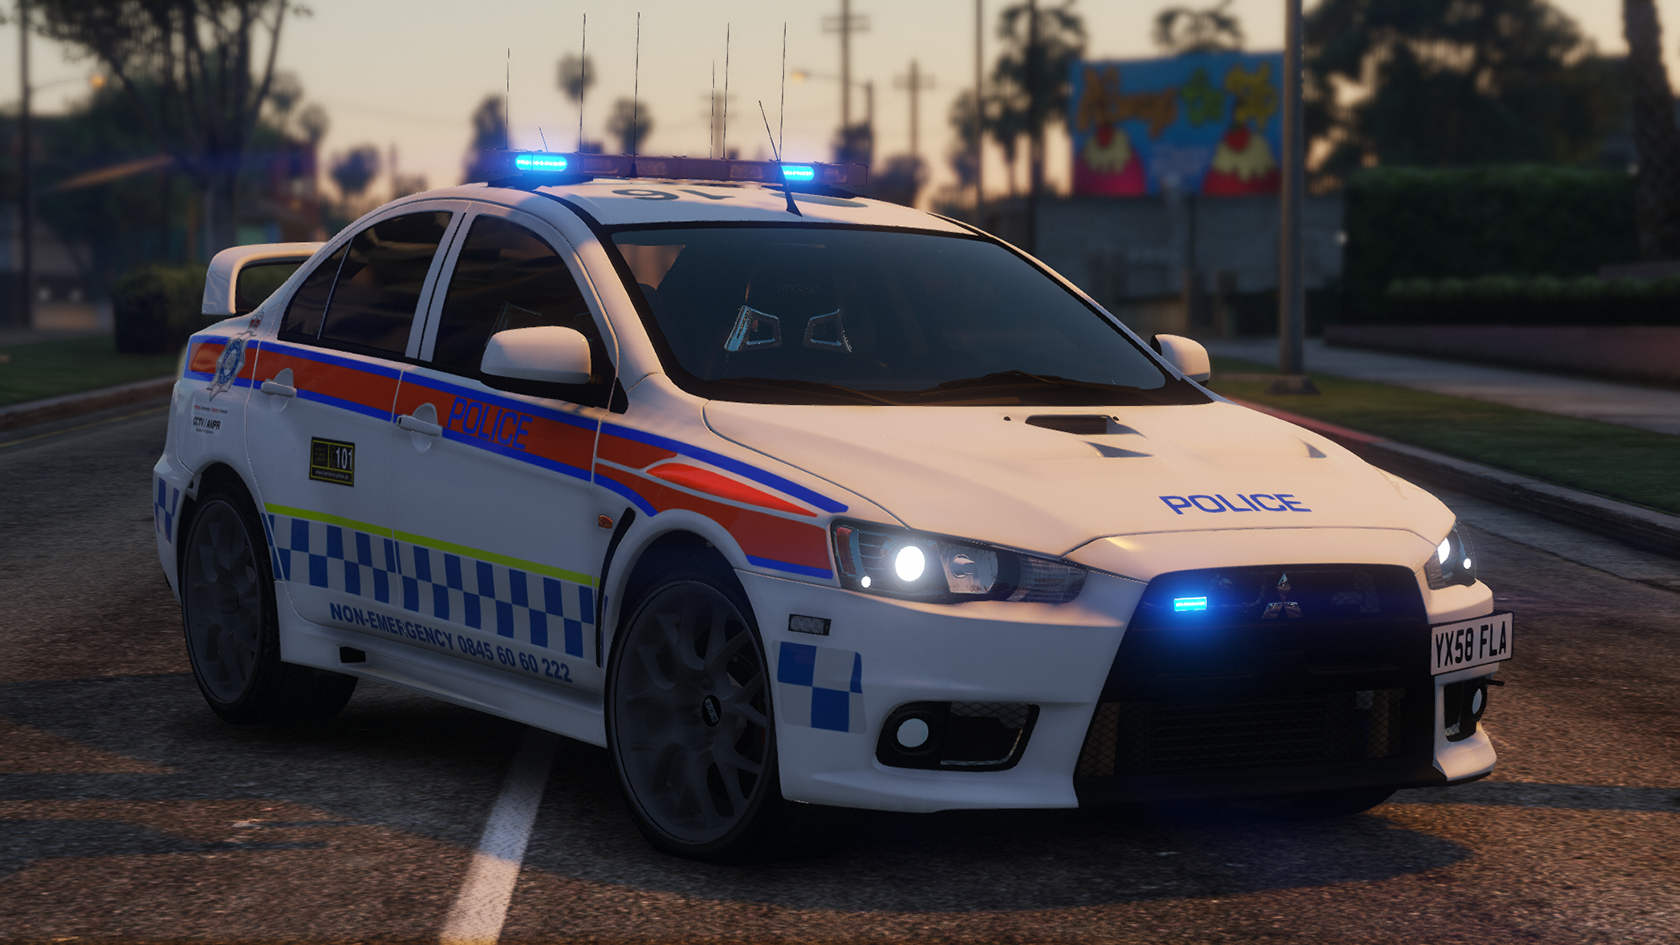 2008 Mitsubishi Evo X - Harthsire Police - GTA5-Mods com